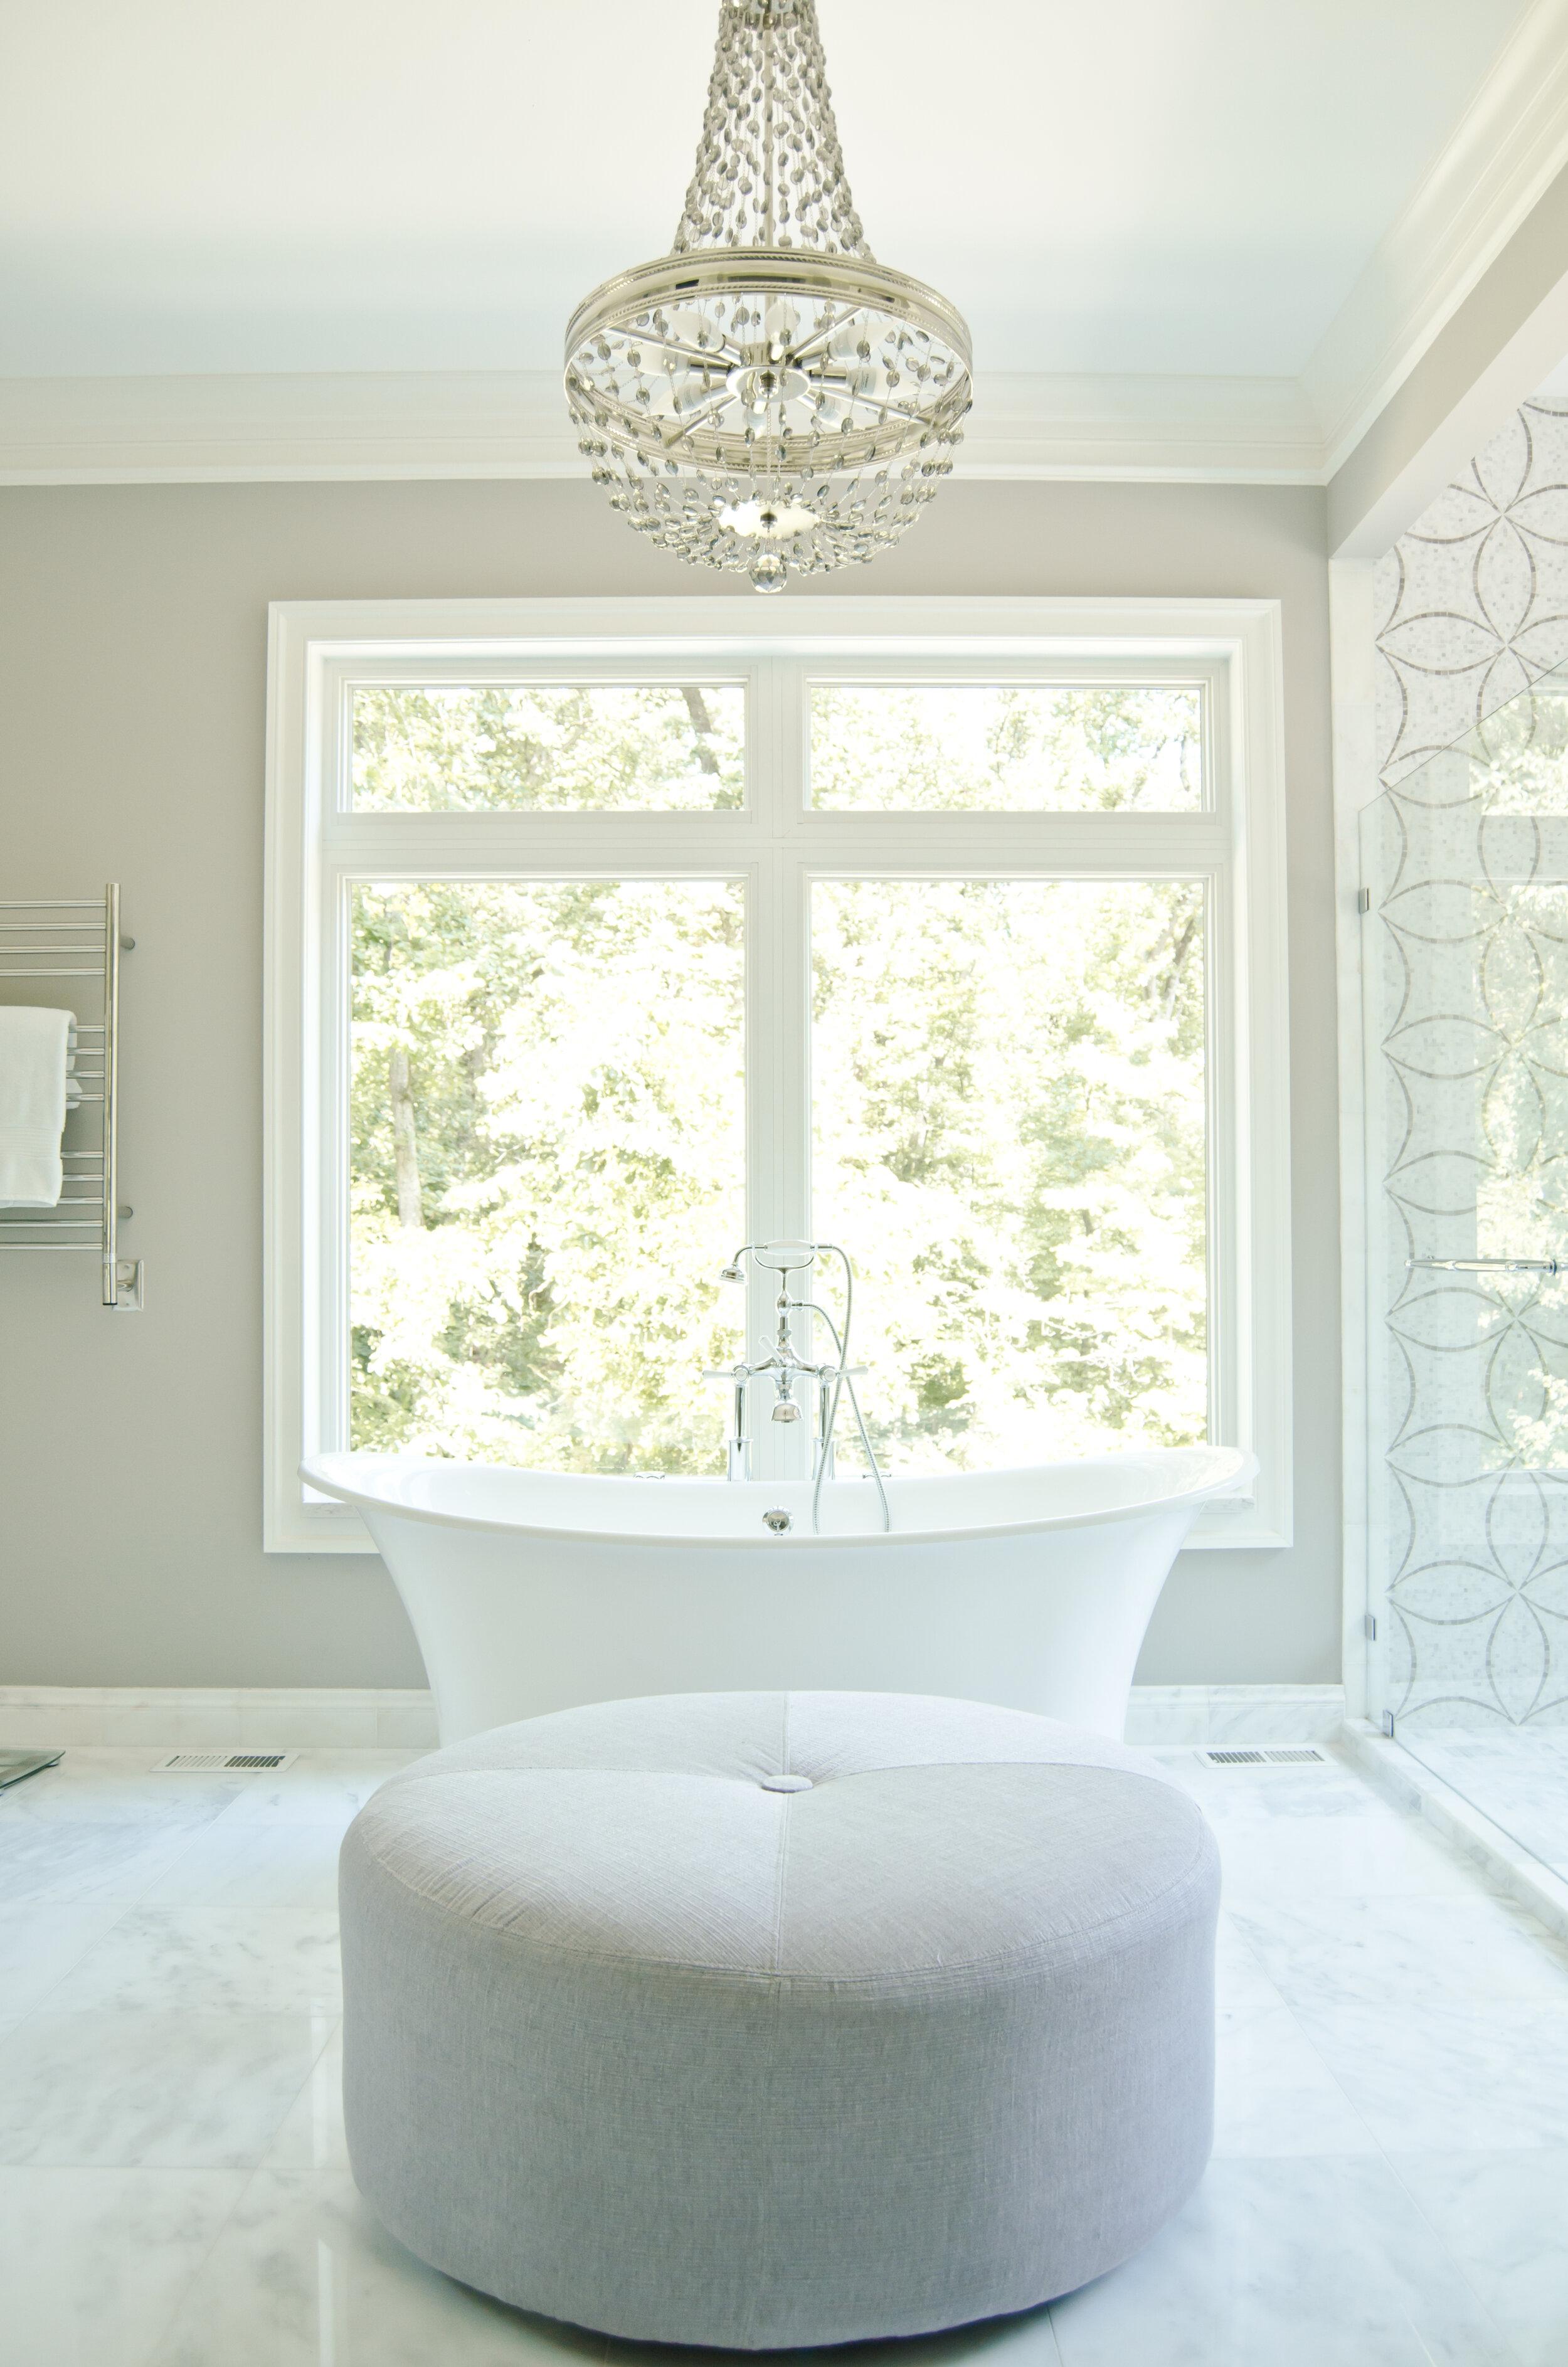 Kerry_Beth_Photo_Courtney_Ludeman_Interiors_Richmond_Interior_Designer_General_Contractor-54.jpg